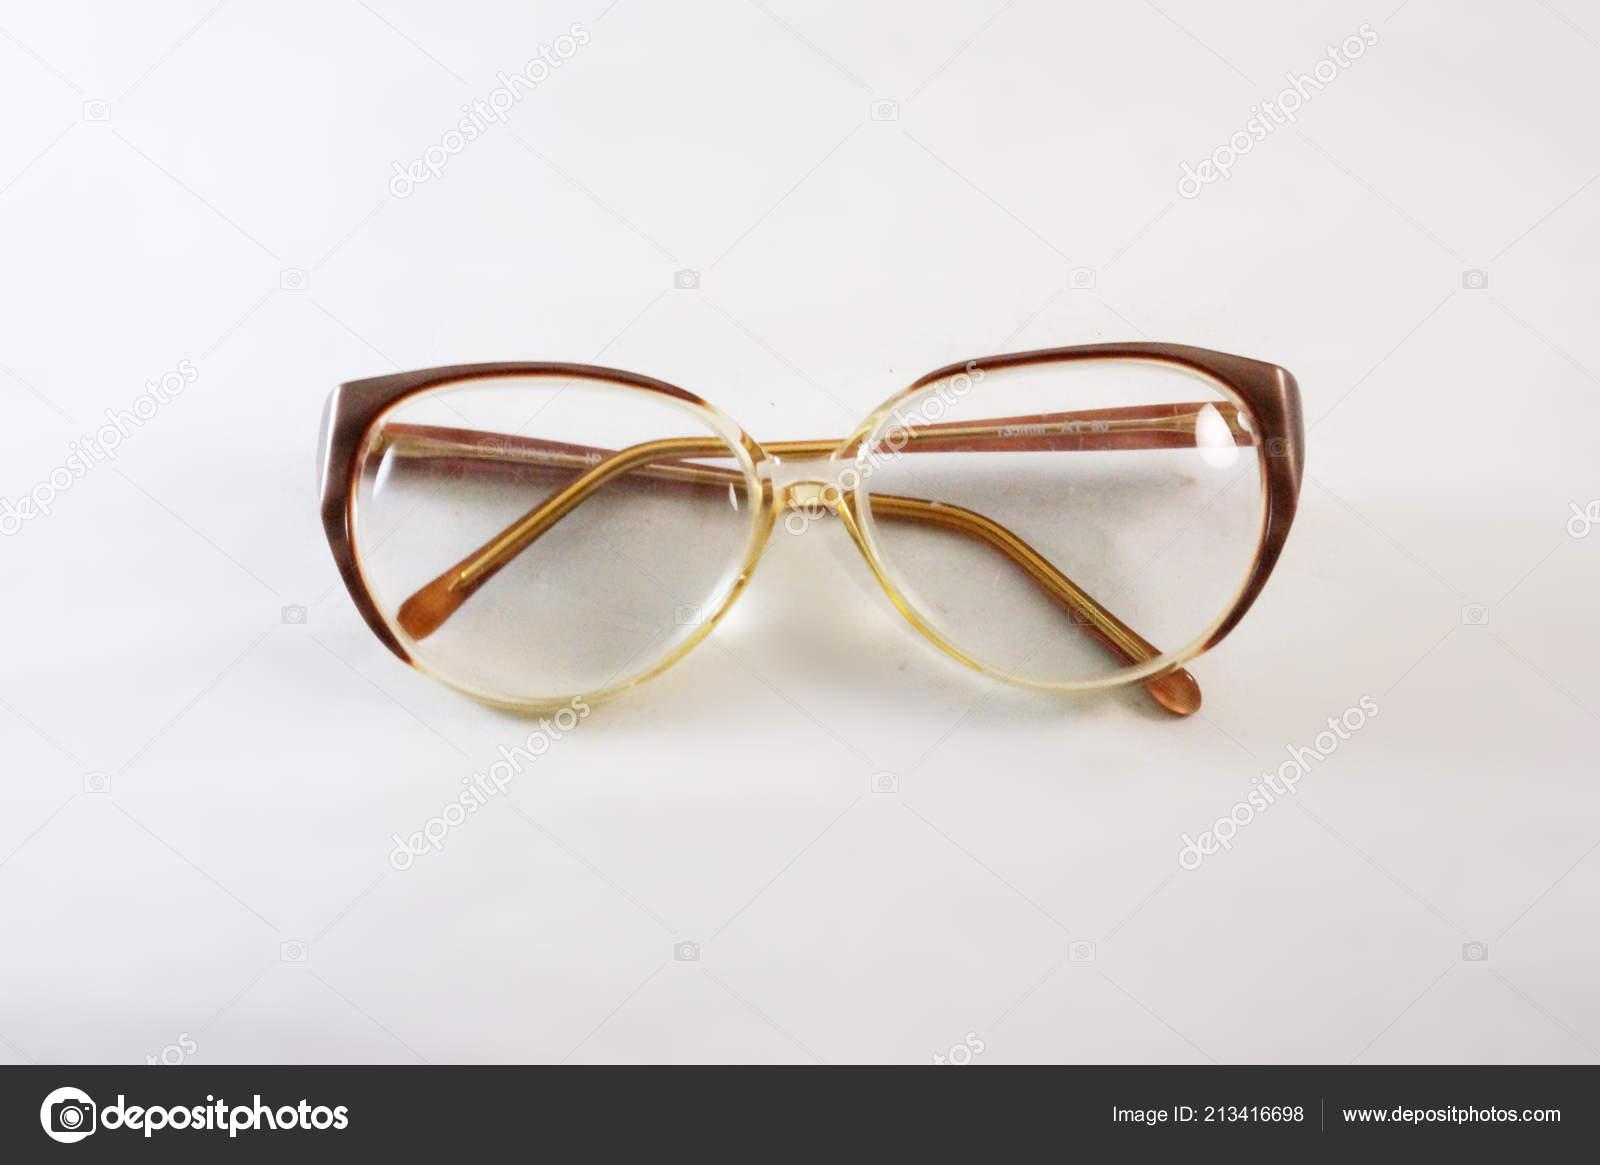 df84a70b1be1 Glasses Eyeglass Frames Plastic Frame Soviet Vintage